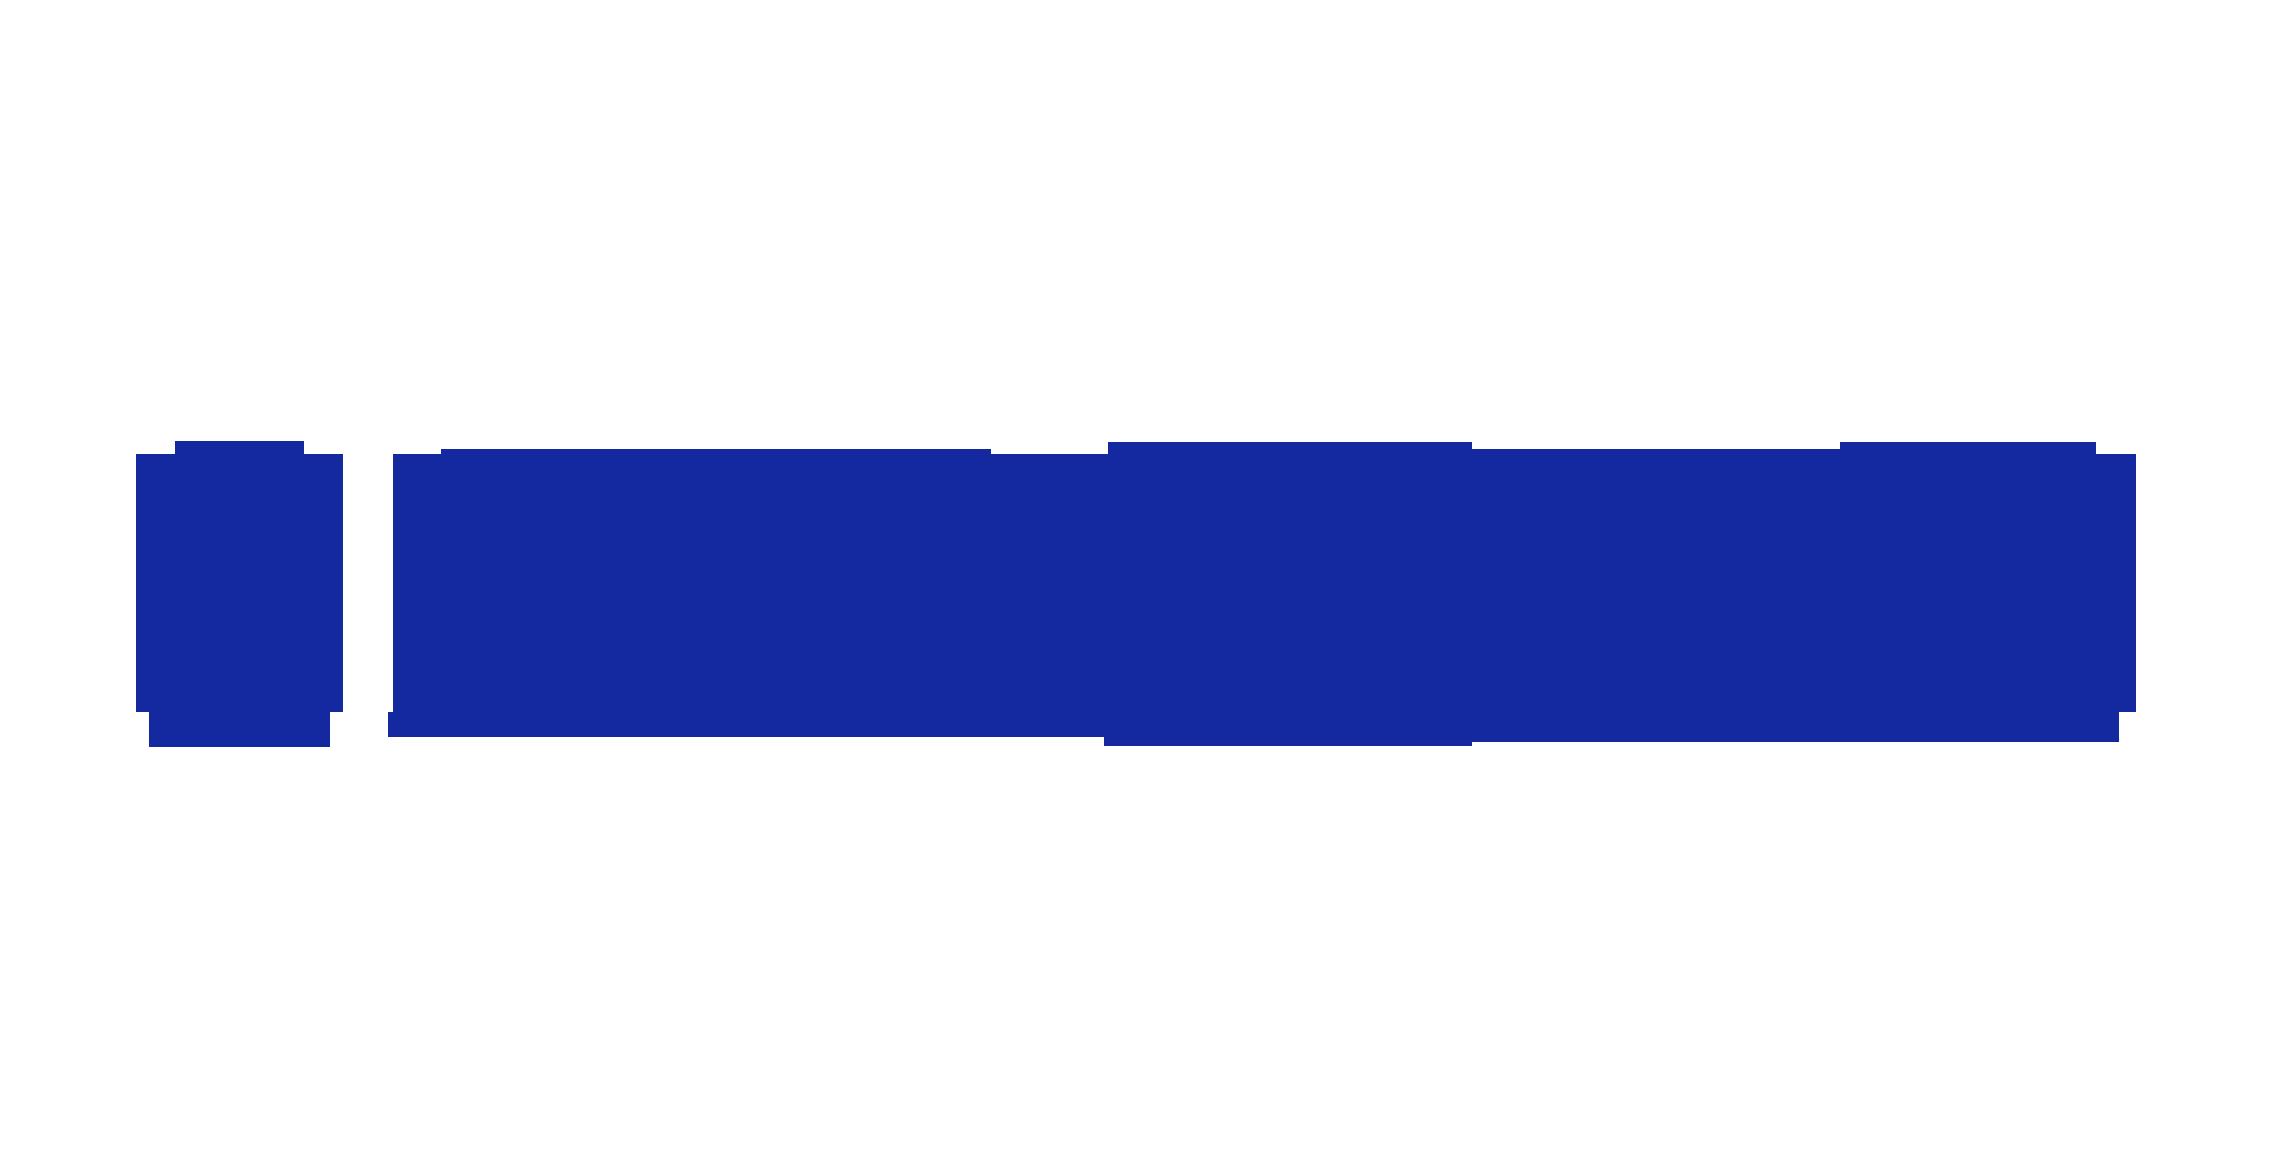 Samsung-logo-2015-Nobg1.png (2272×1158)   Samsung logo ...